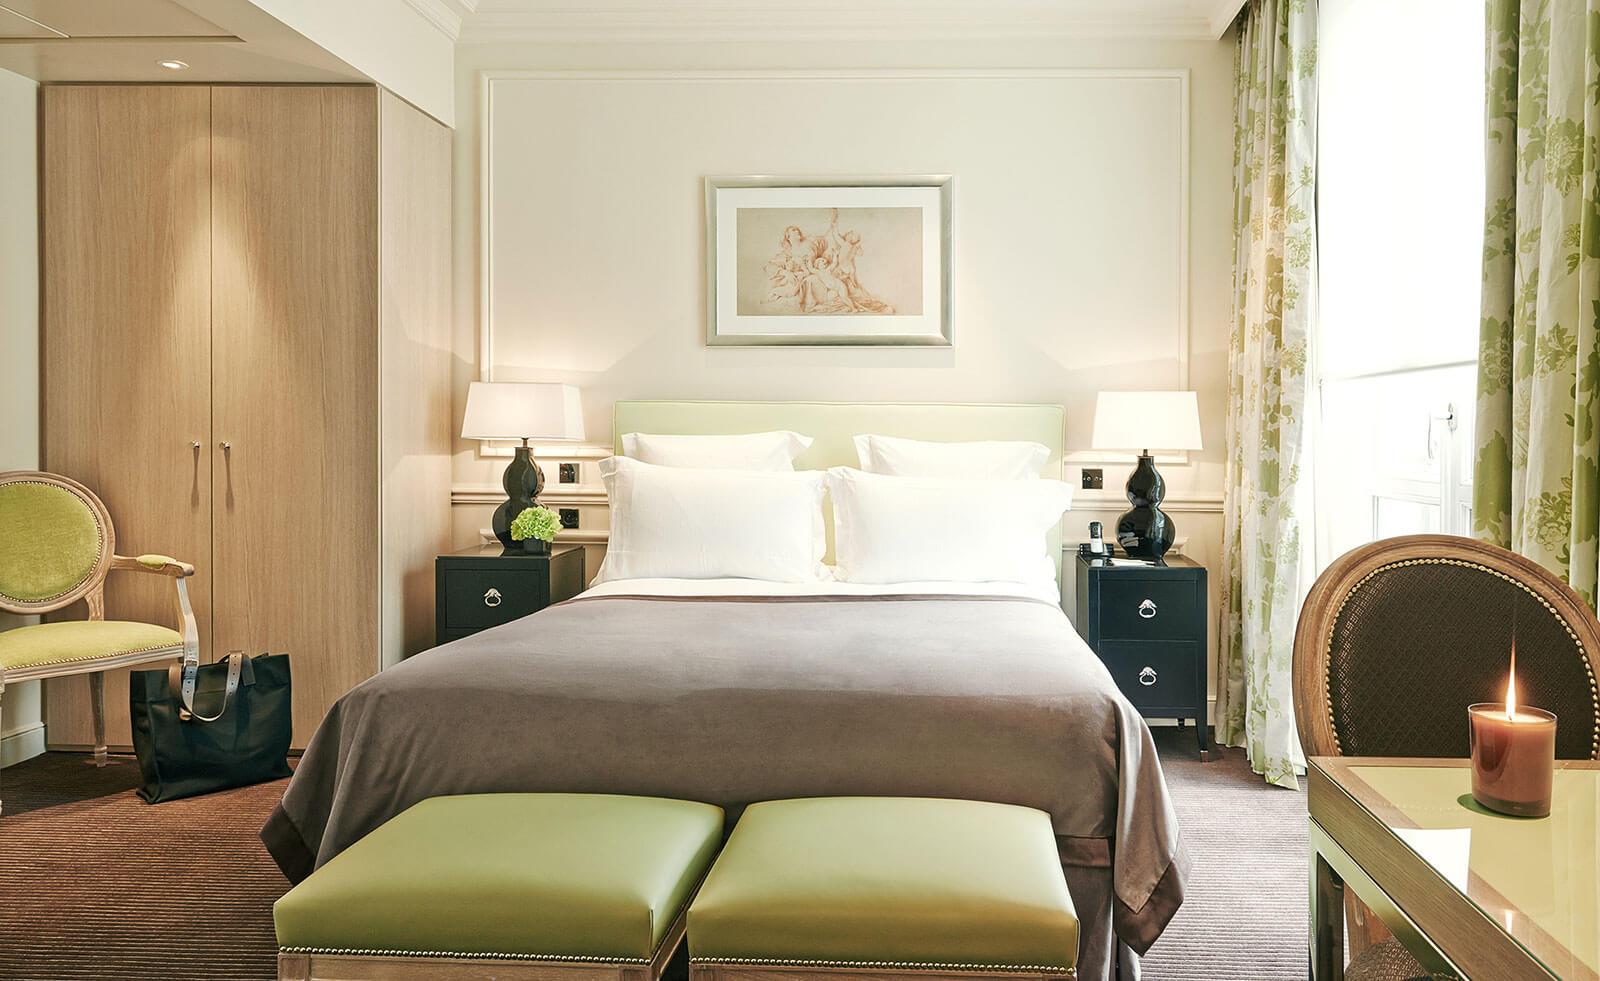 Quarto Deluxe, cama, Grand Hôtel du Palais Royal, Paris 1er